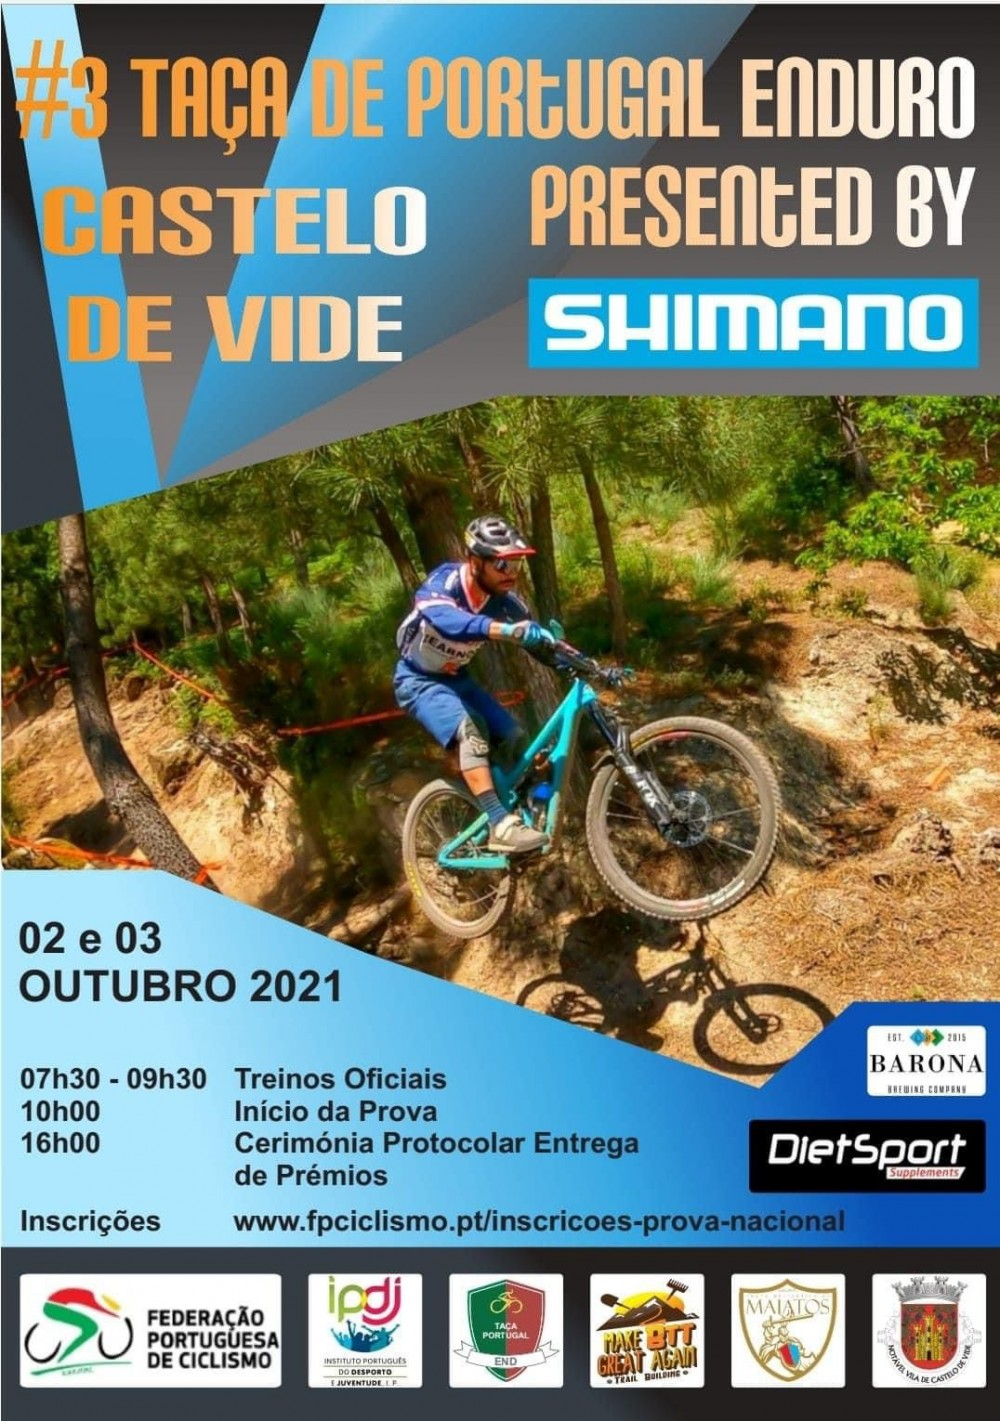 3ª Taça de Portugal Enduro presented by Shimano